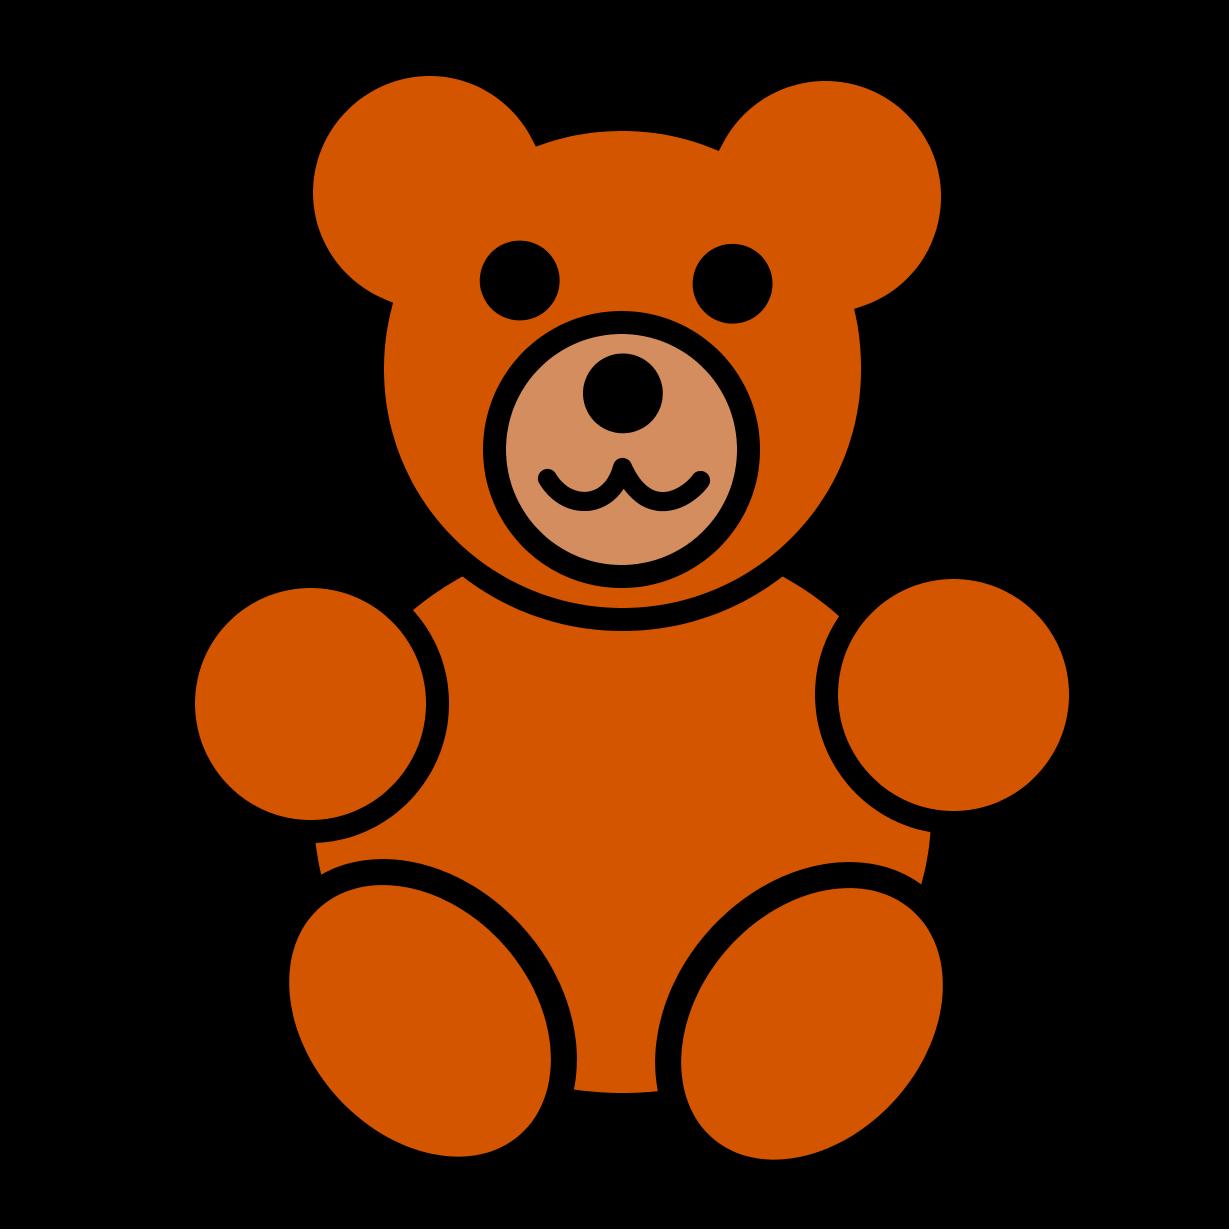 1229x1229 Free Teddy Bear Clipart